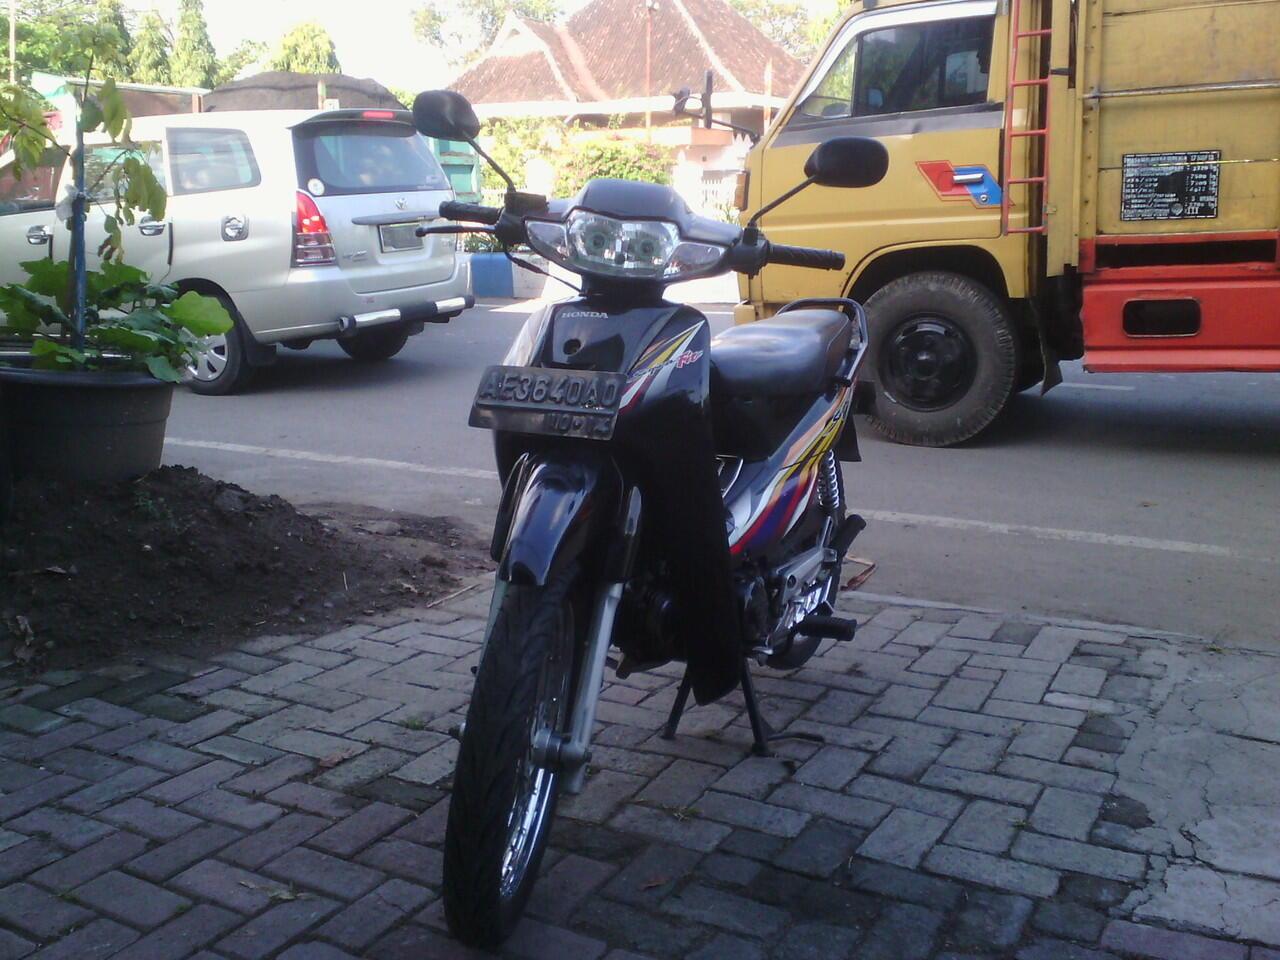 Terjual Supra Fit 2004 Madiun Magetan Ngawi Ponorogo5 Kaskus